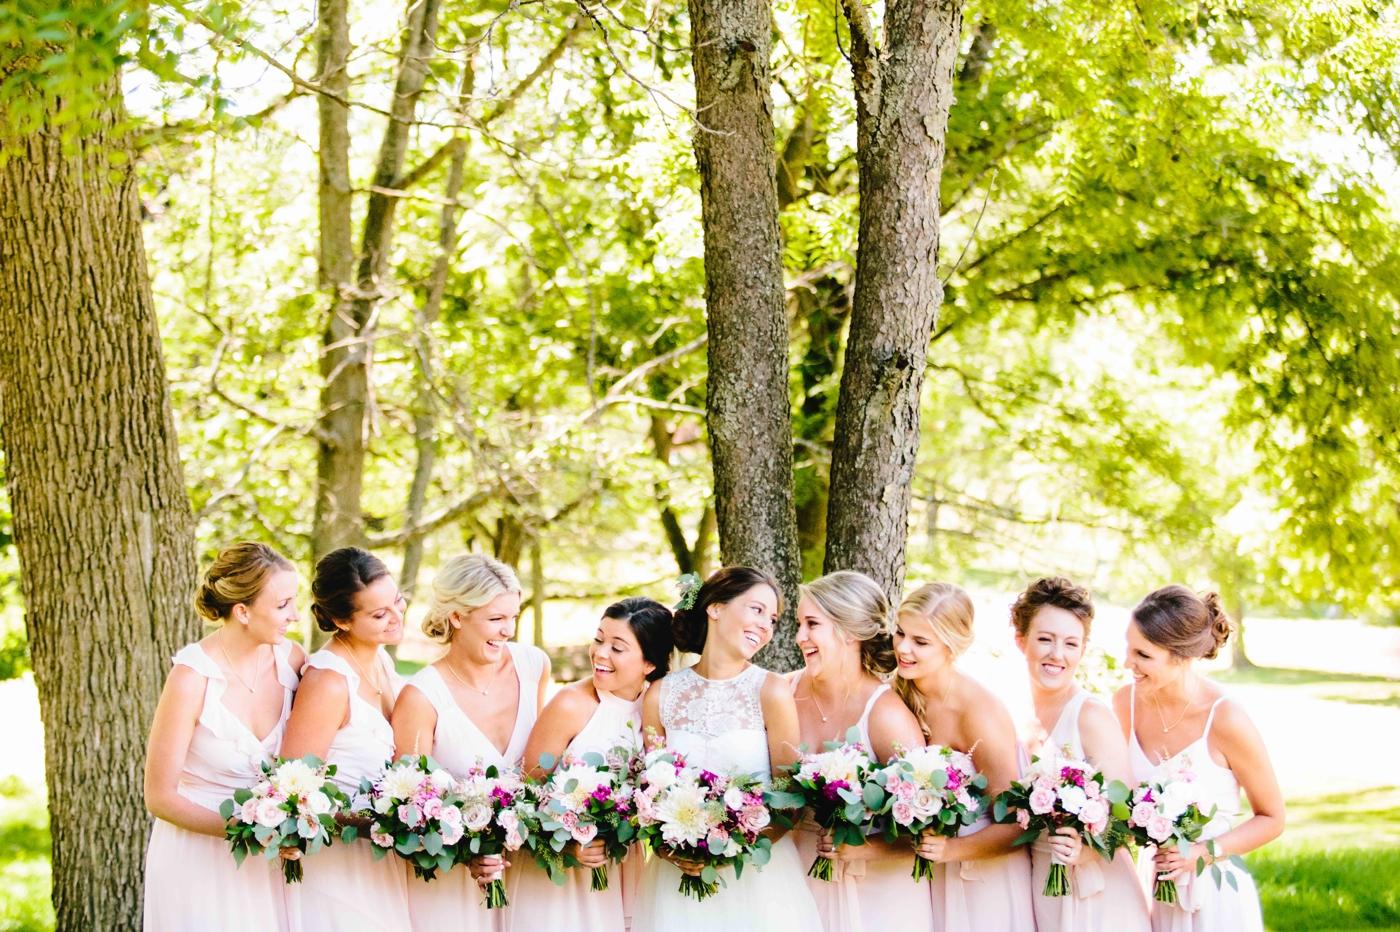 chicago-fine-art-wedding-photography-tyma16